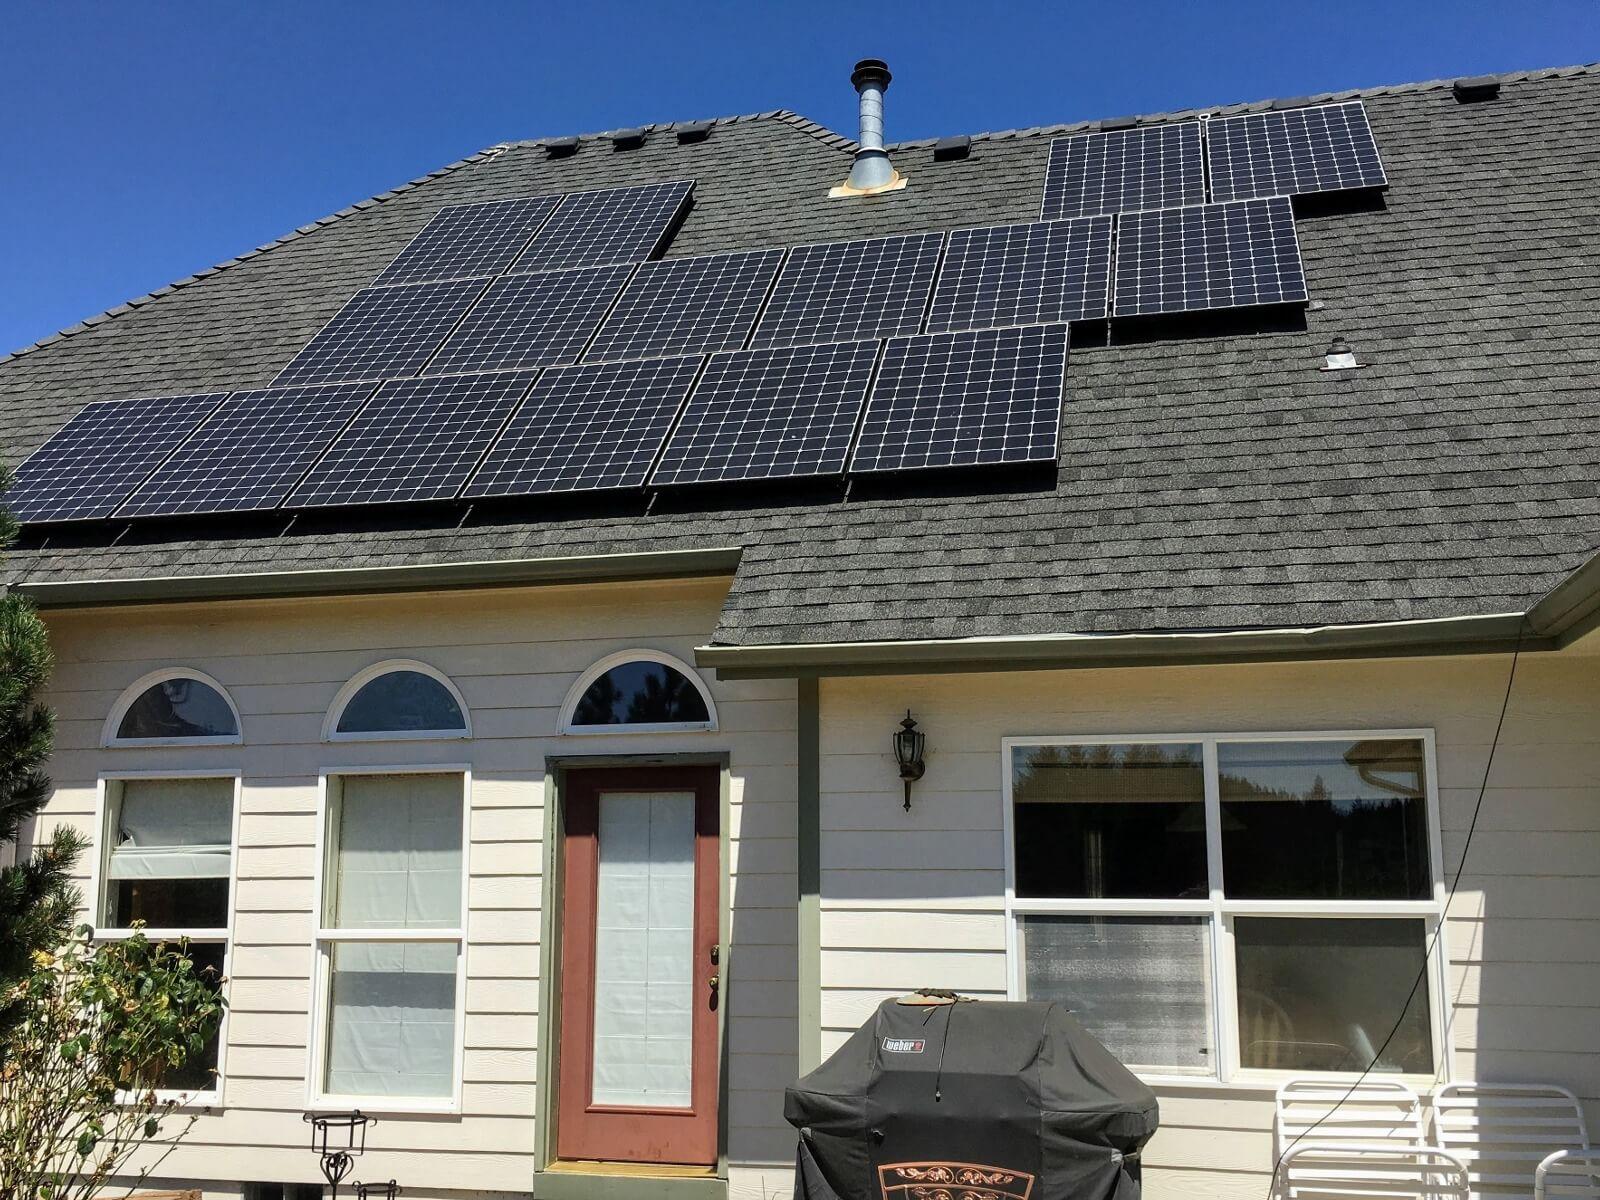 Washington solar panels on residential home.jpeg